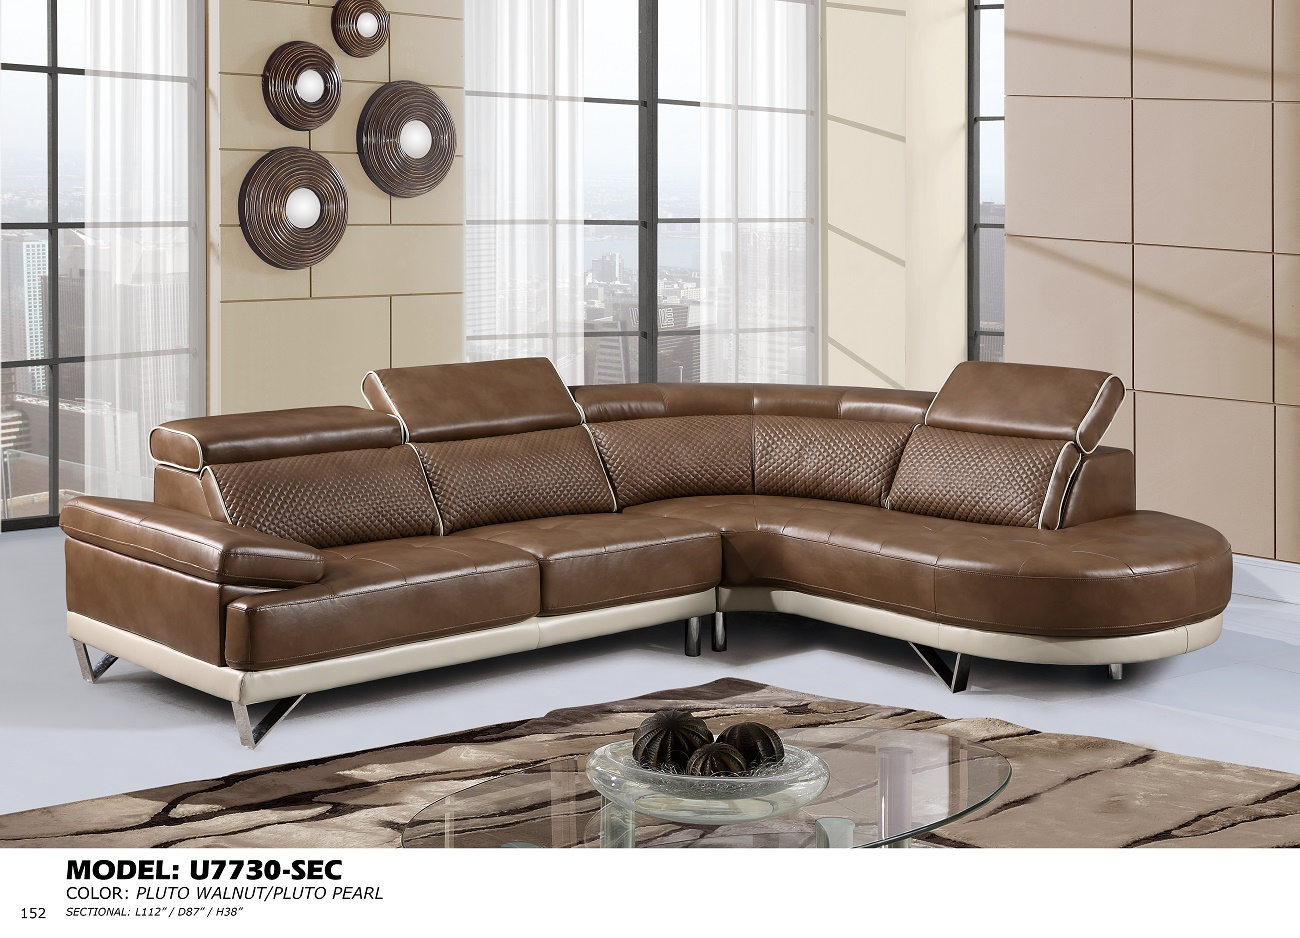 U7730 walnut pearl sectional sofa